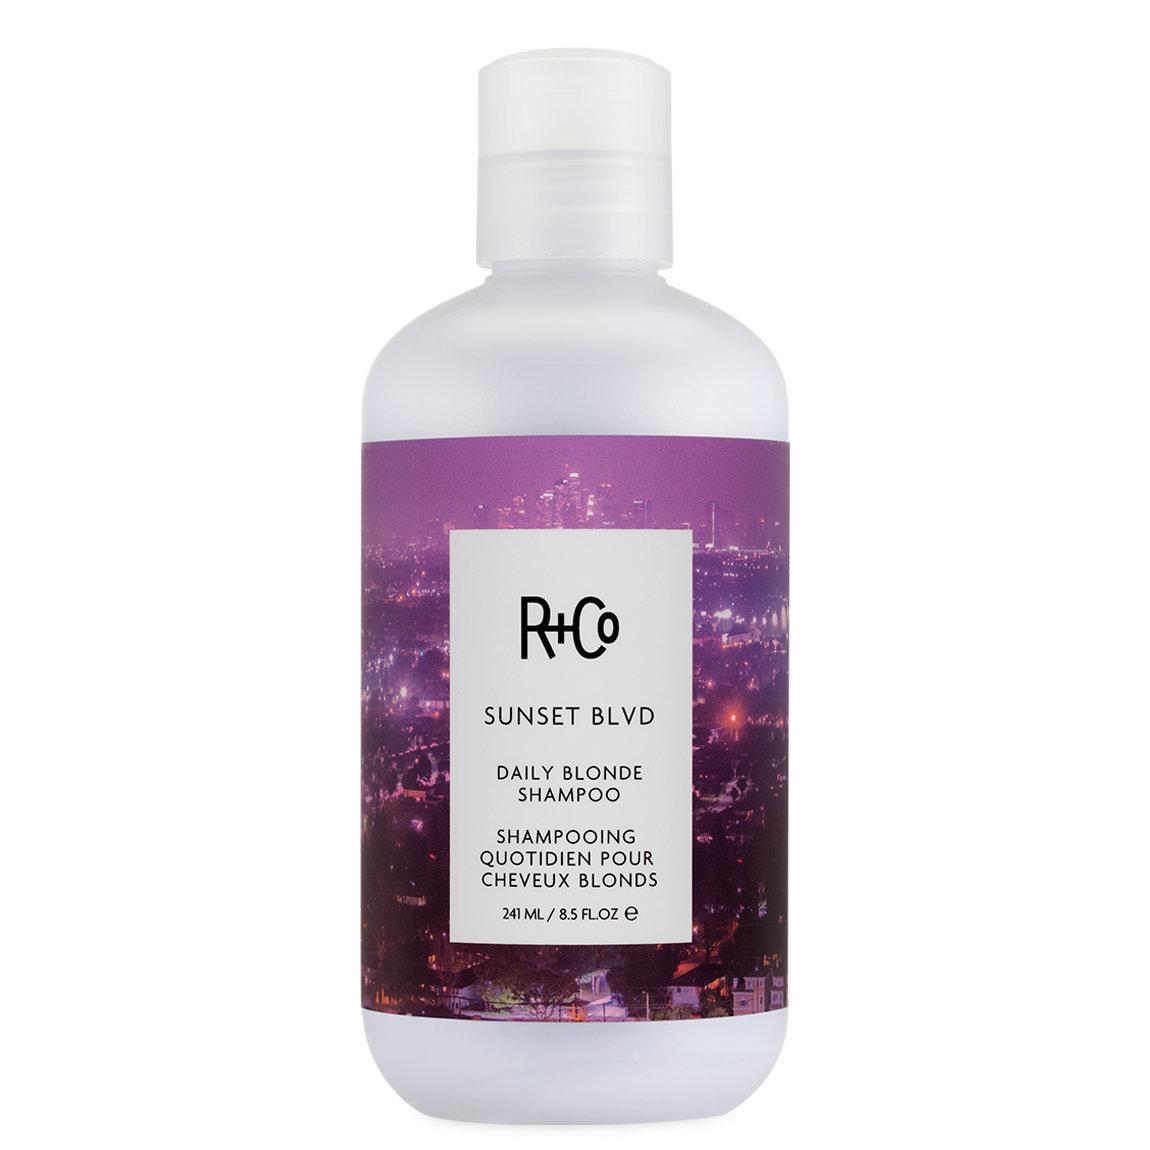 R+Co Sunset Blvd Blonde Shampoo 8.5 oz alternative view 1 - product swatch.